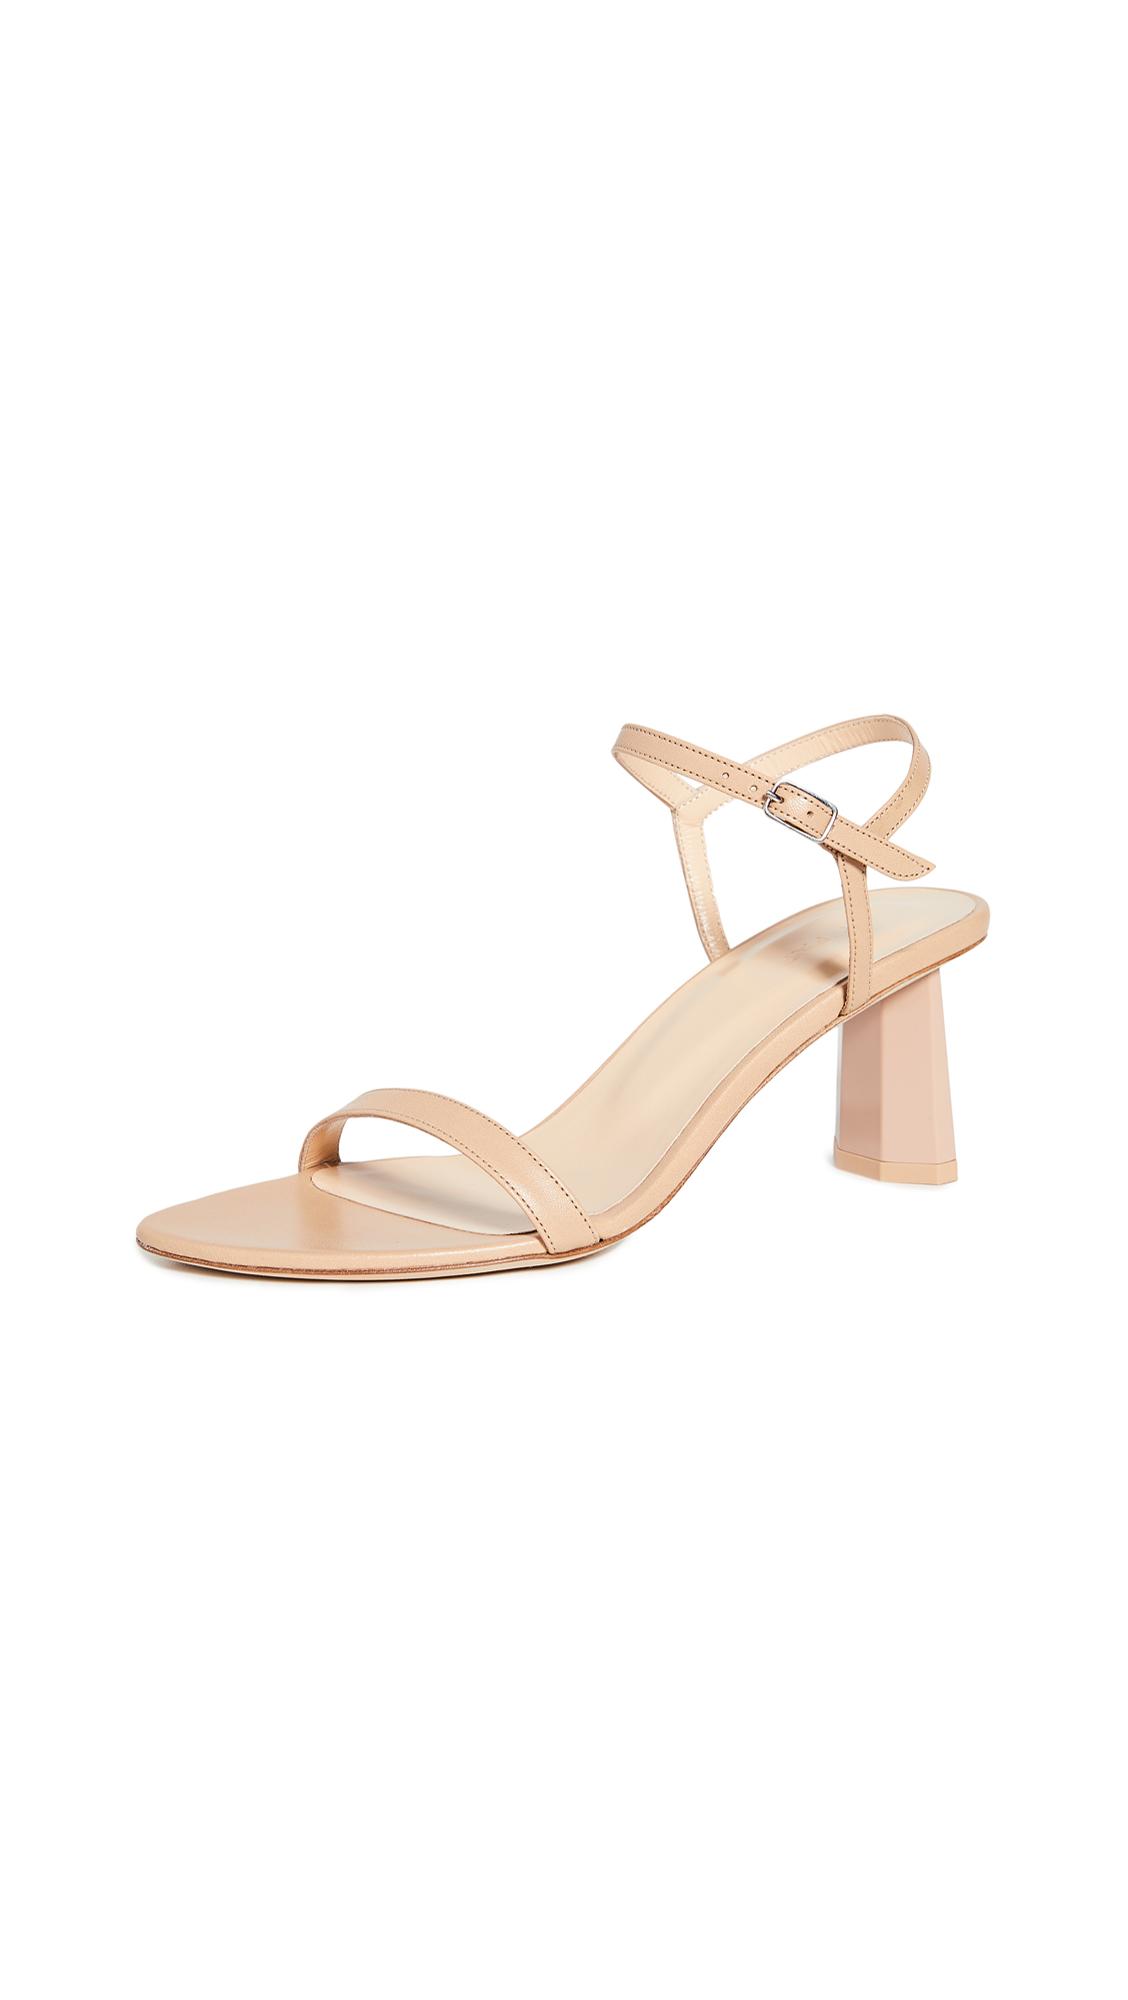 BY FAR Magnolia Sandals - 30% Off Sale